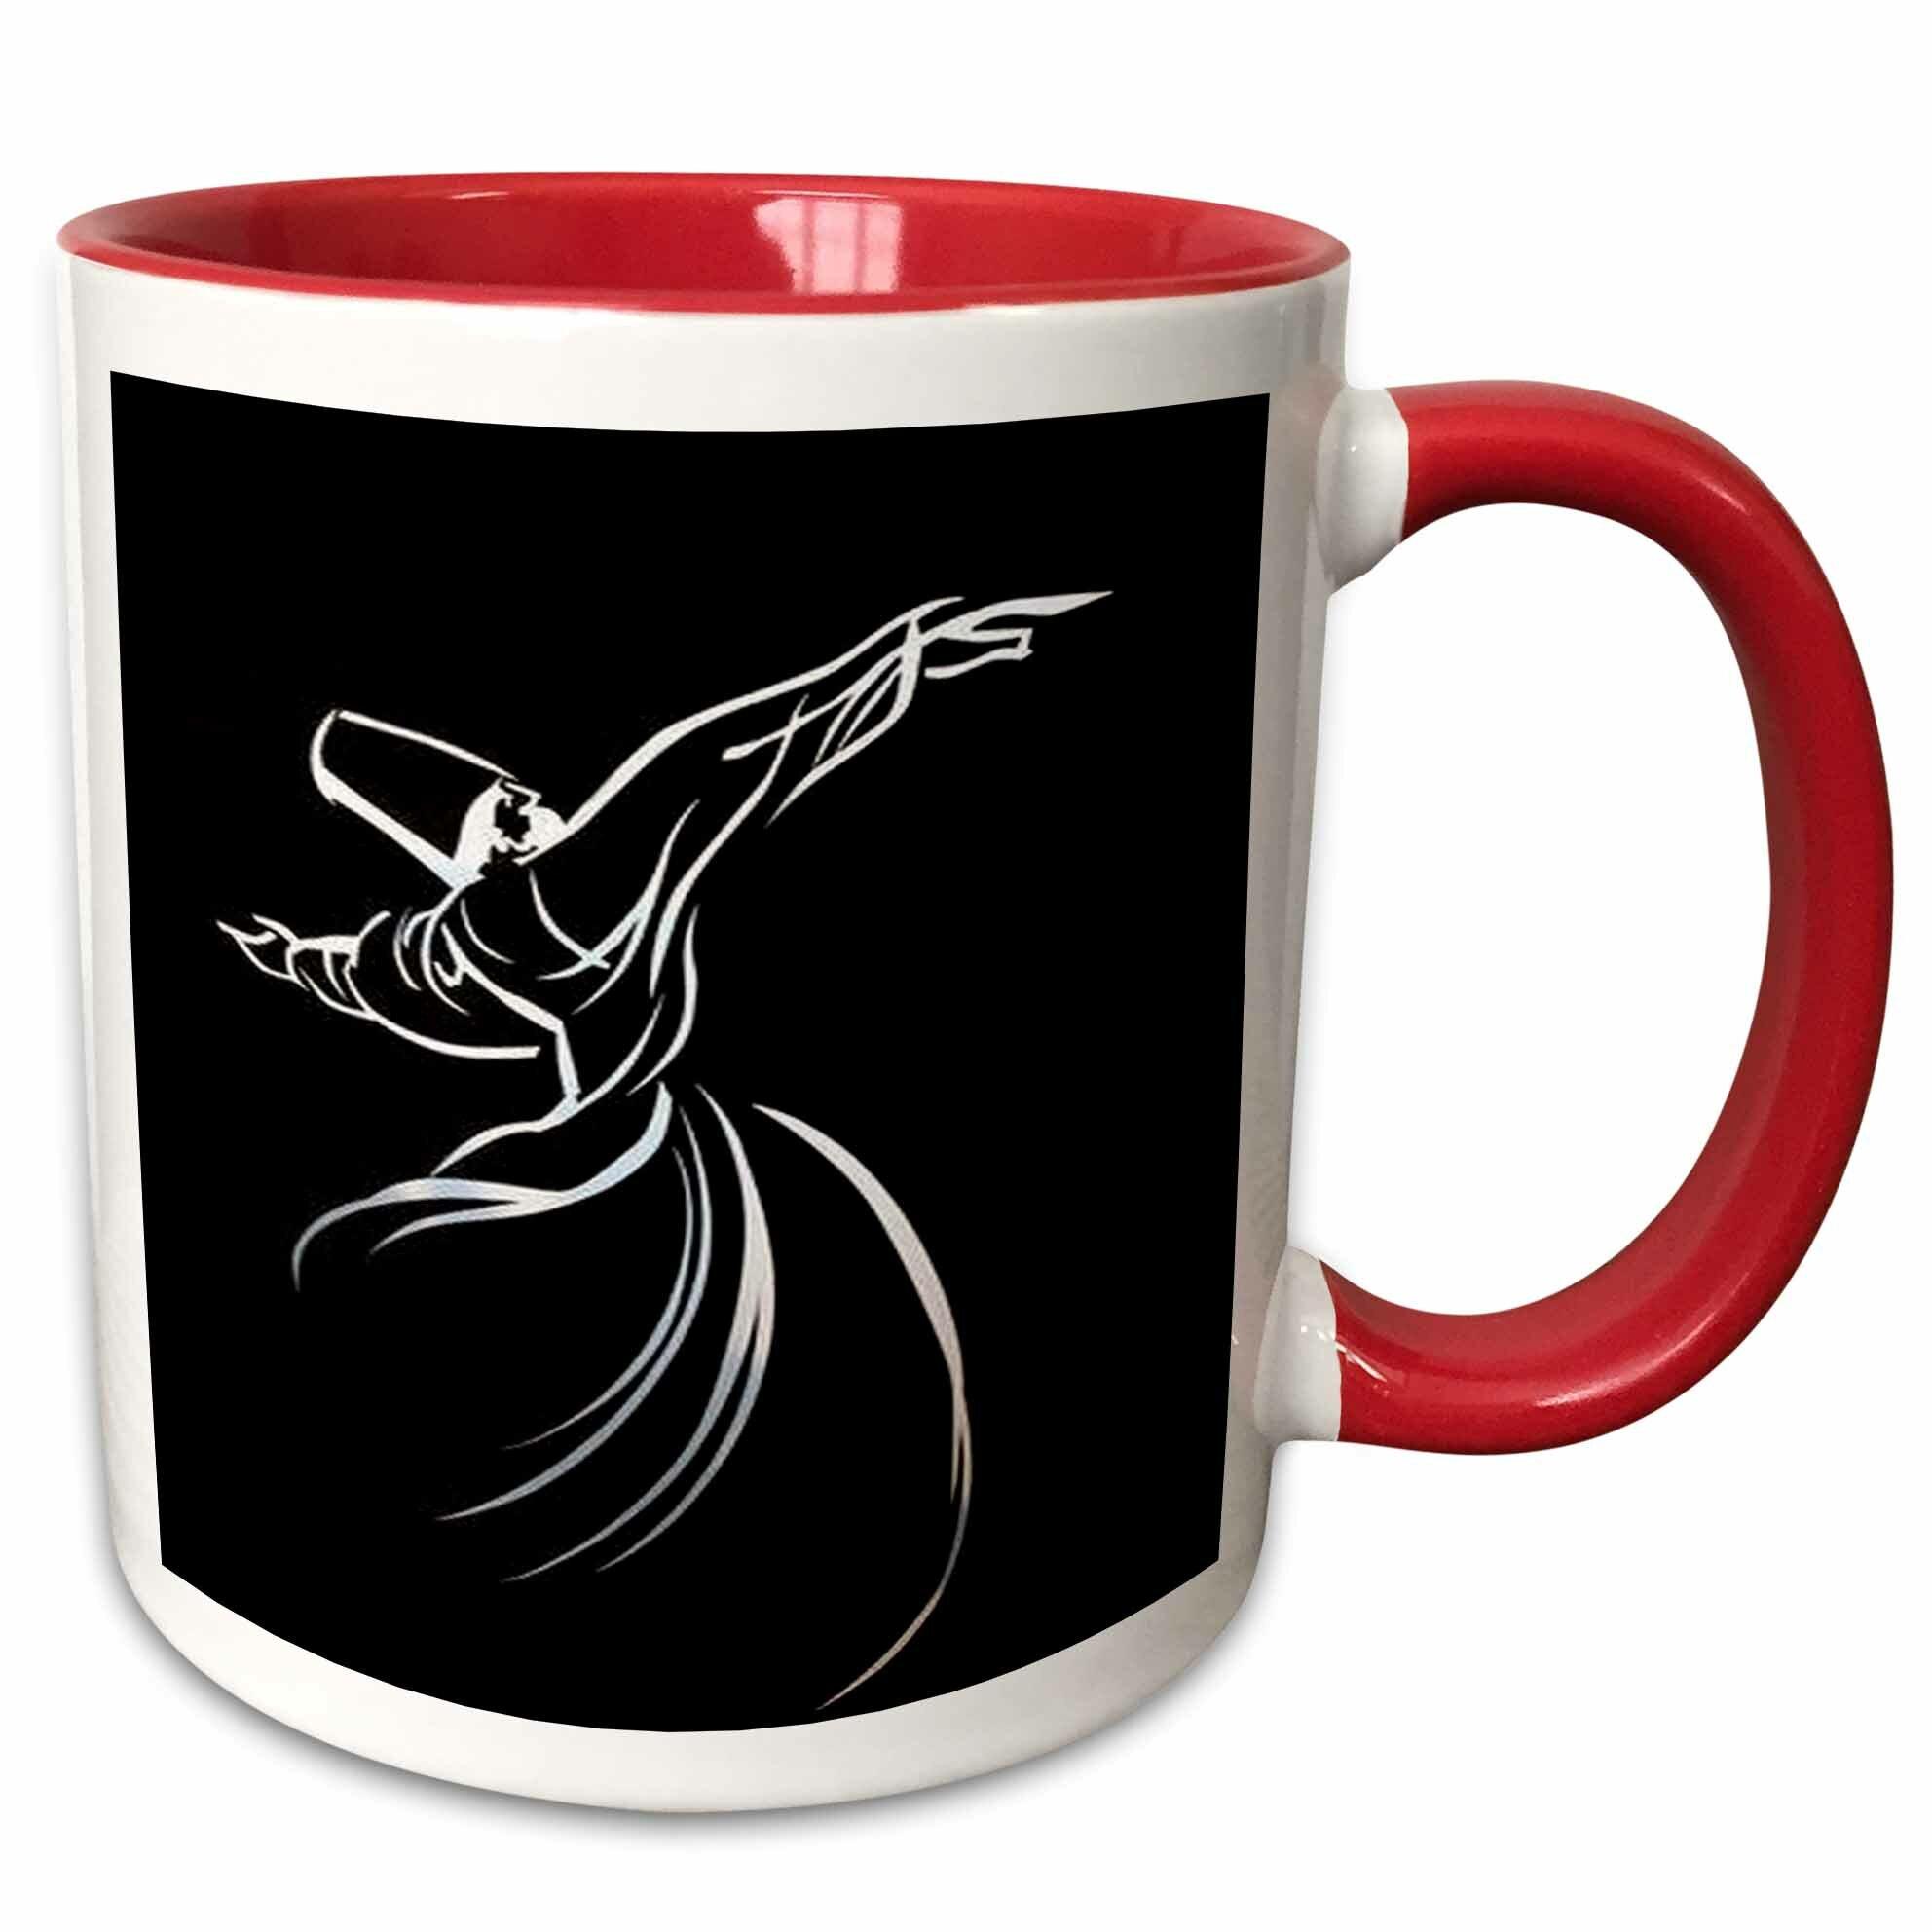 Symple Stuff Schuller Whirling Dervish Coffee Mug Wayfair